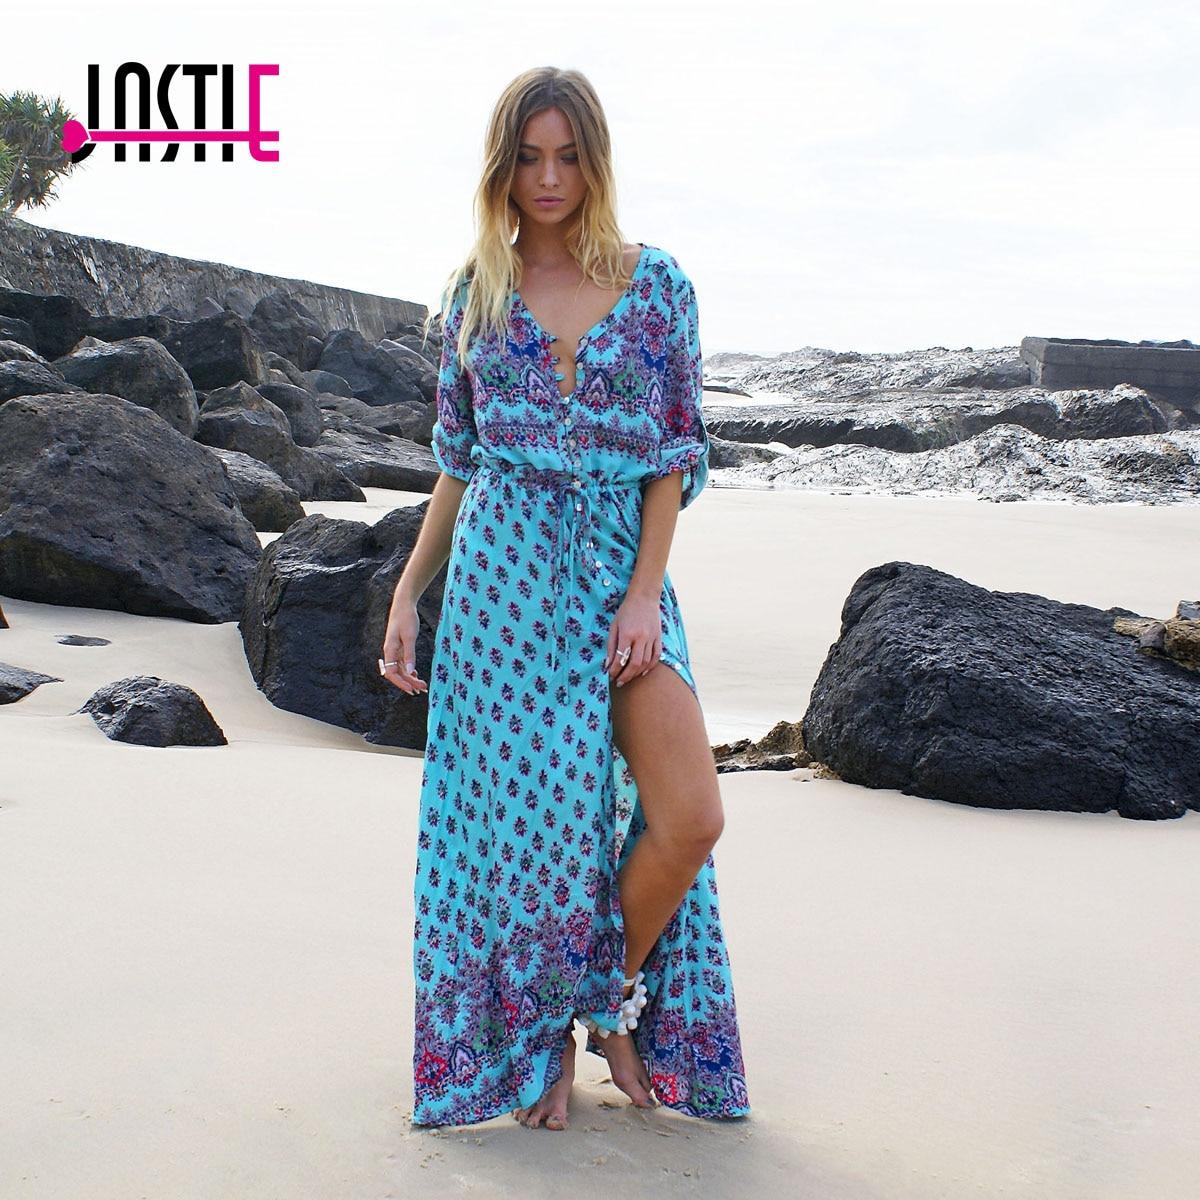 Jastie Vintage Floral Printed Maxi Dress 3/4 Sleeve Boho Beach Dresses Loose Casual V-Neck Split Tunic Summer Women Vestidos